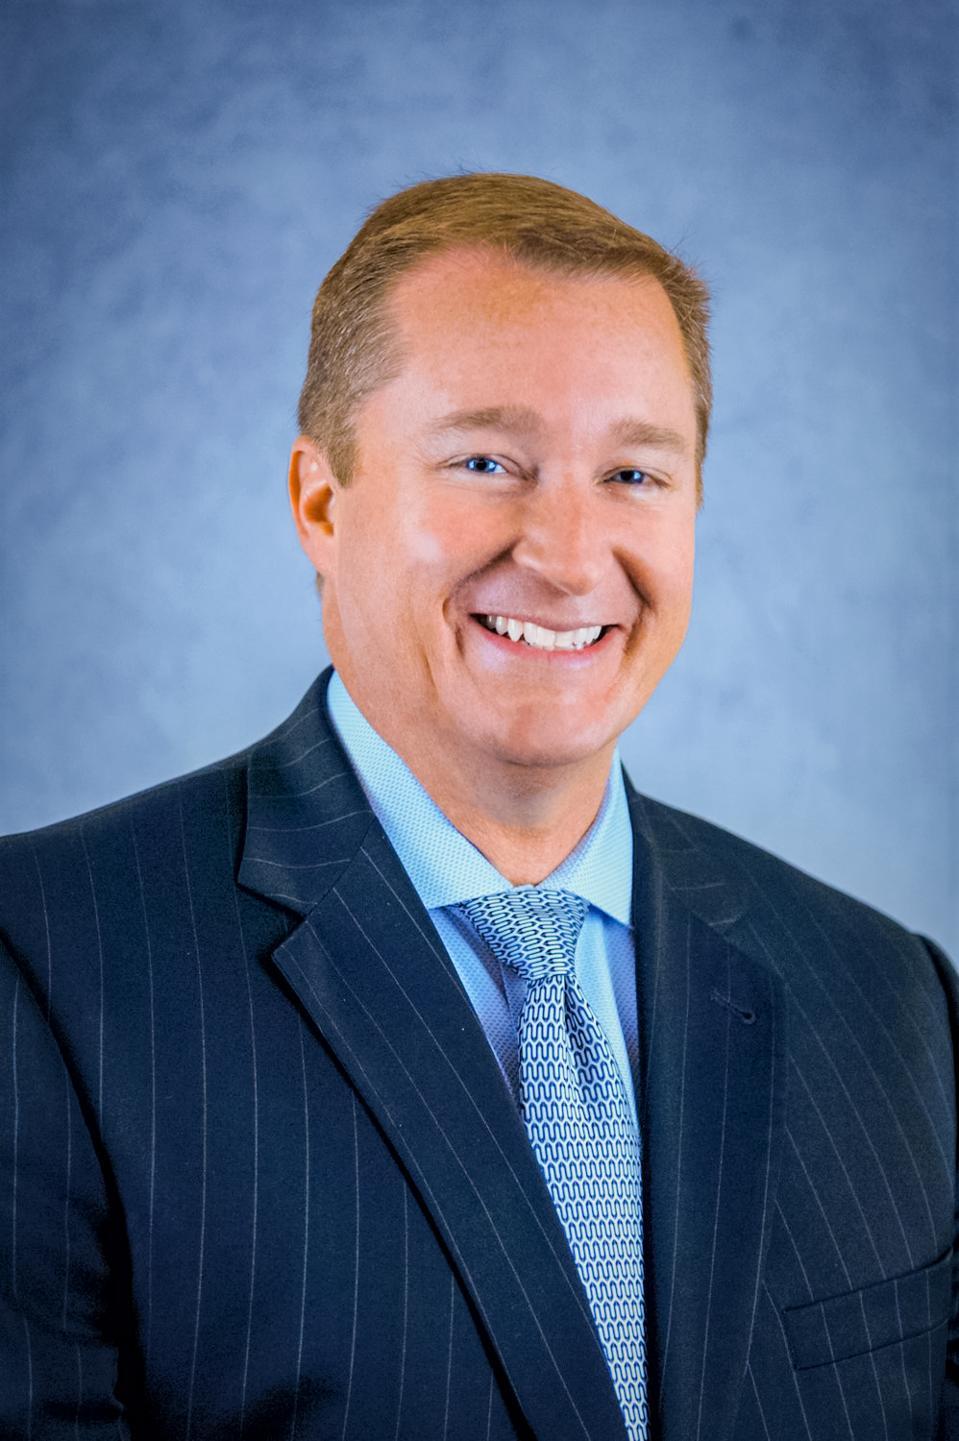 Headshot of Brian Cobb, the Chief Innovation Officer at Cincinnati/Northern Kentucky International Airport (CVG)